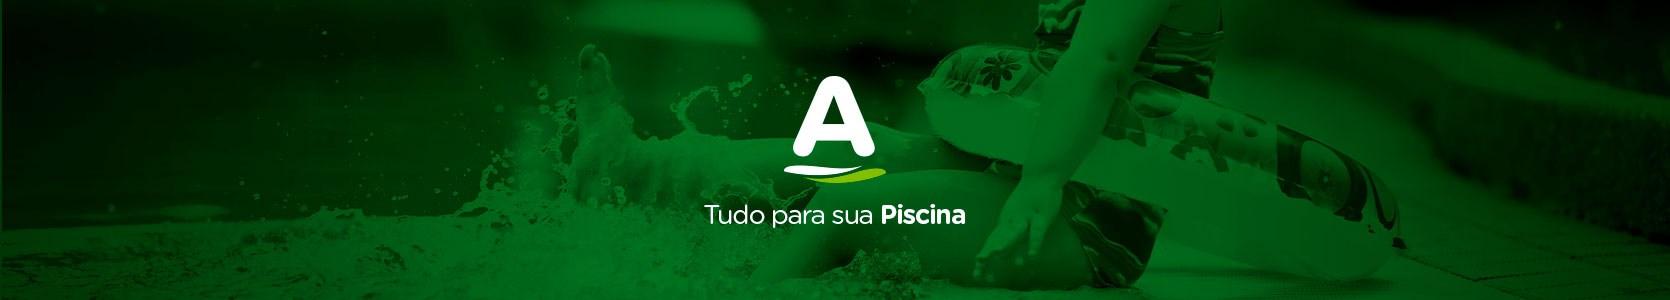 Agrosolo Piscina